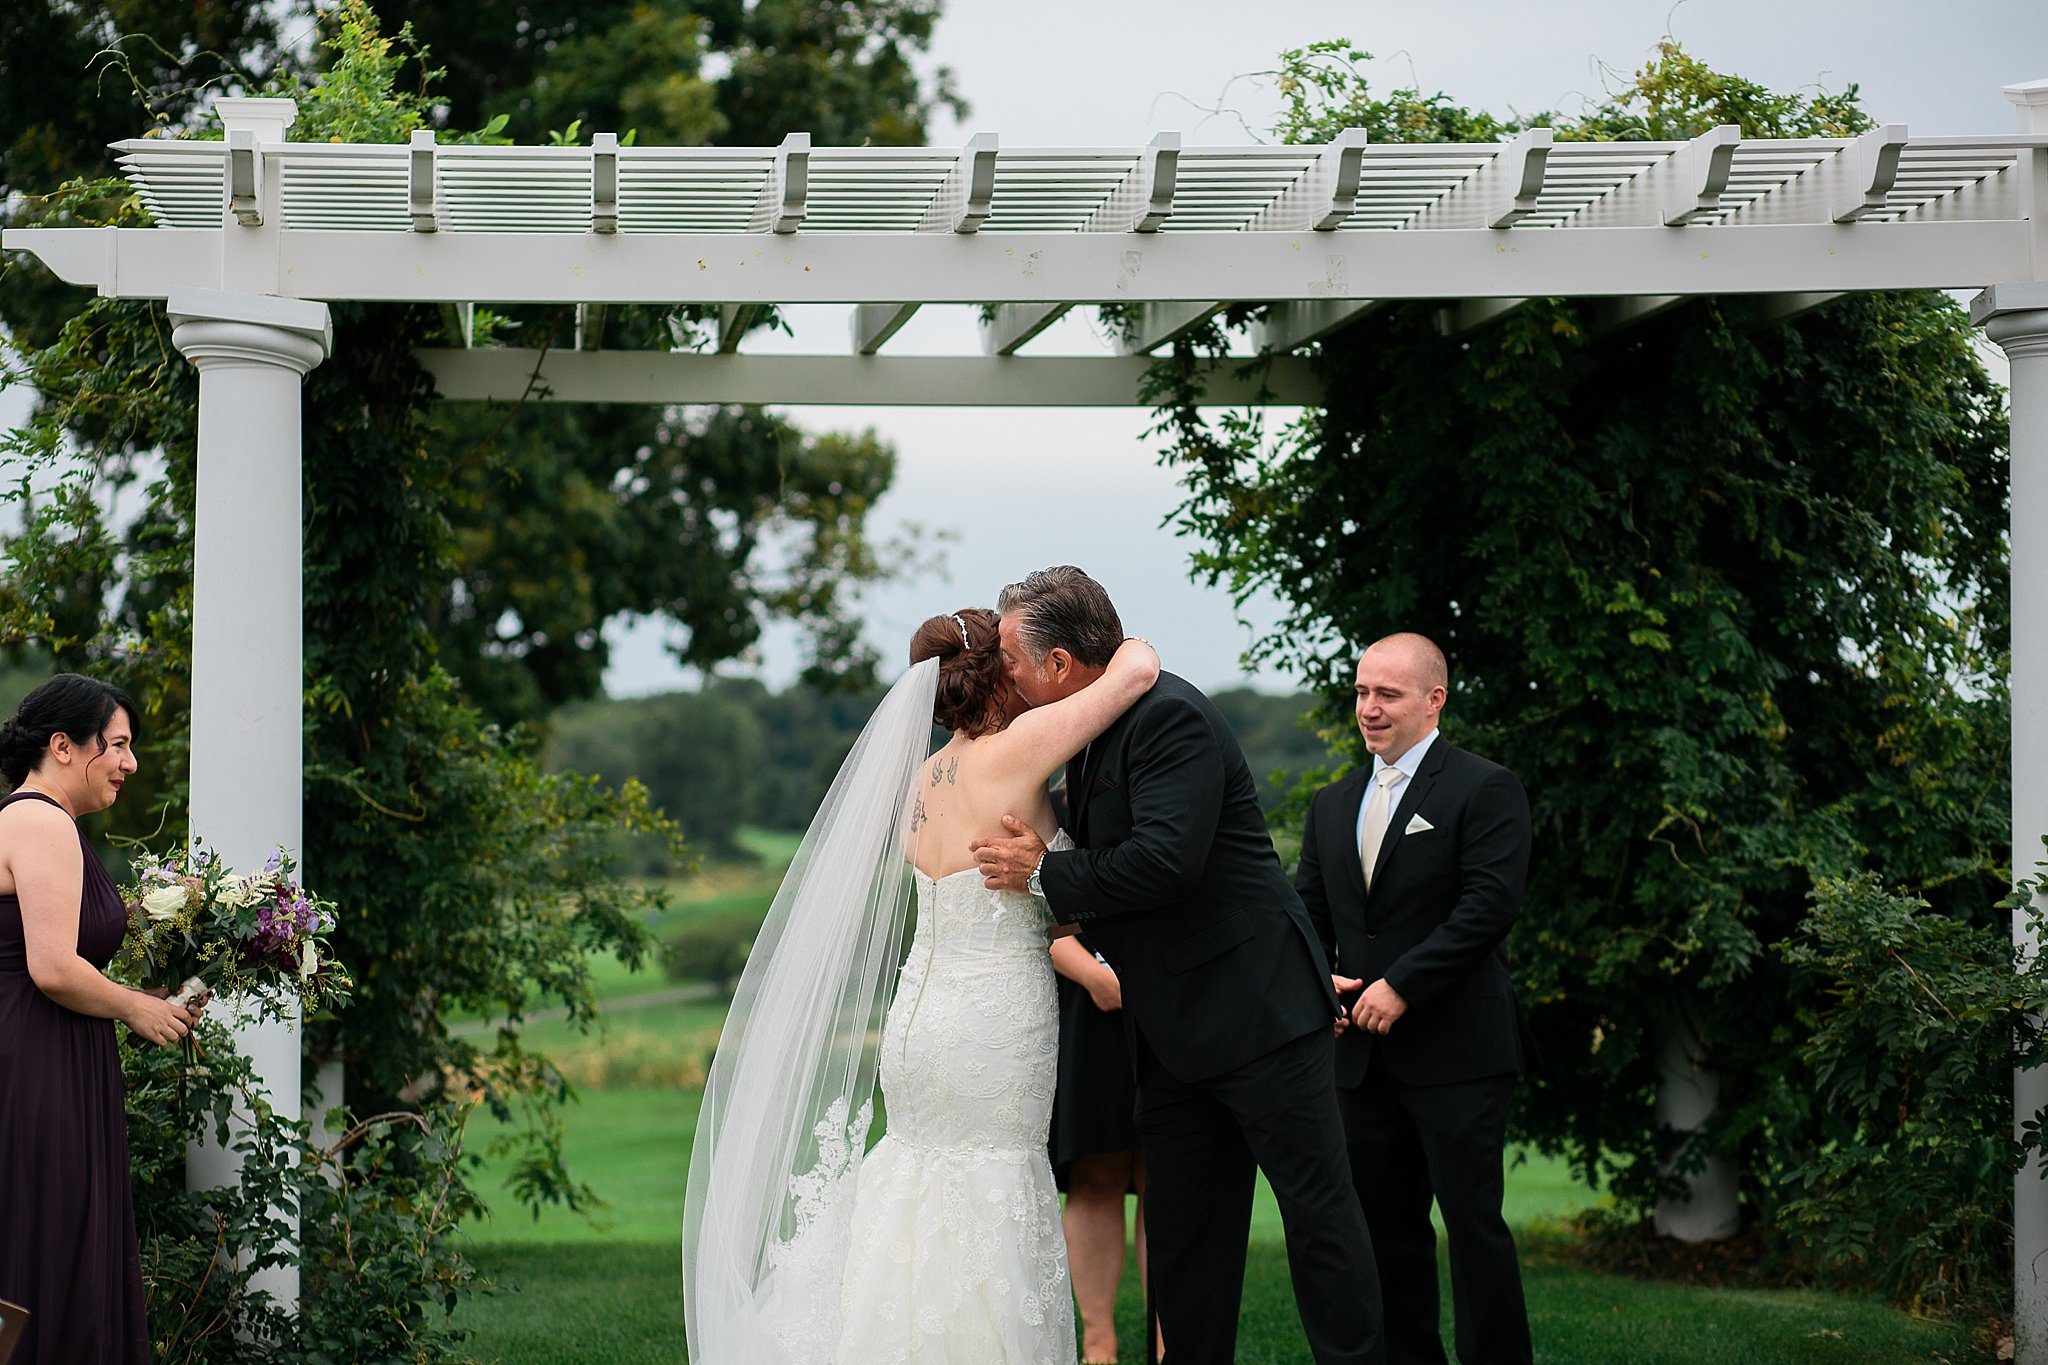 Links at Unionvale Wedding Lagrangeville Wedding Hudson Valley Wedding Photographer Sweet Alice Photography29.jpg